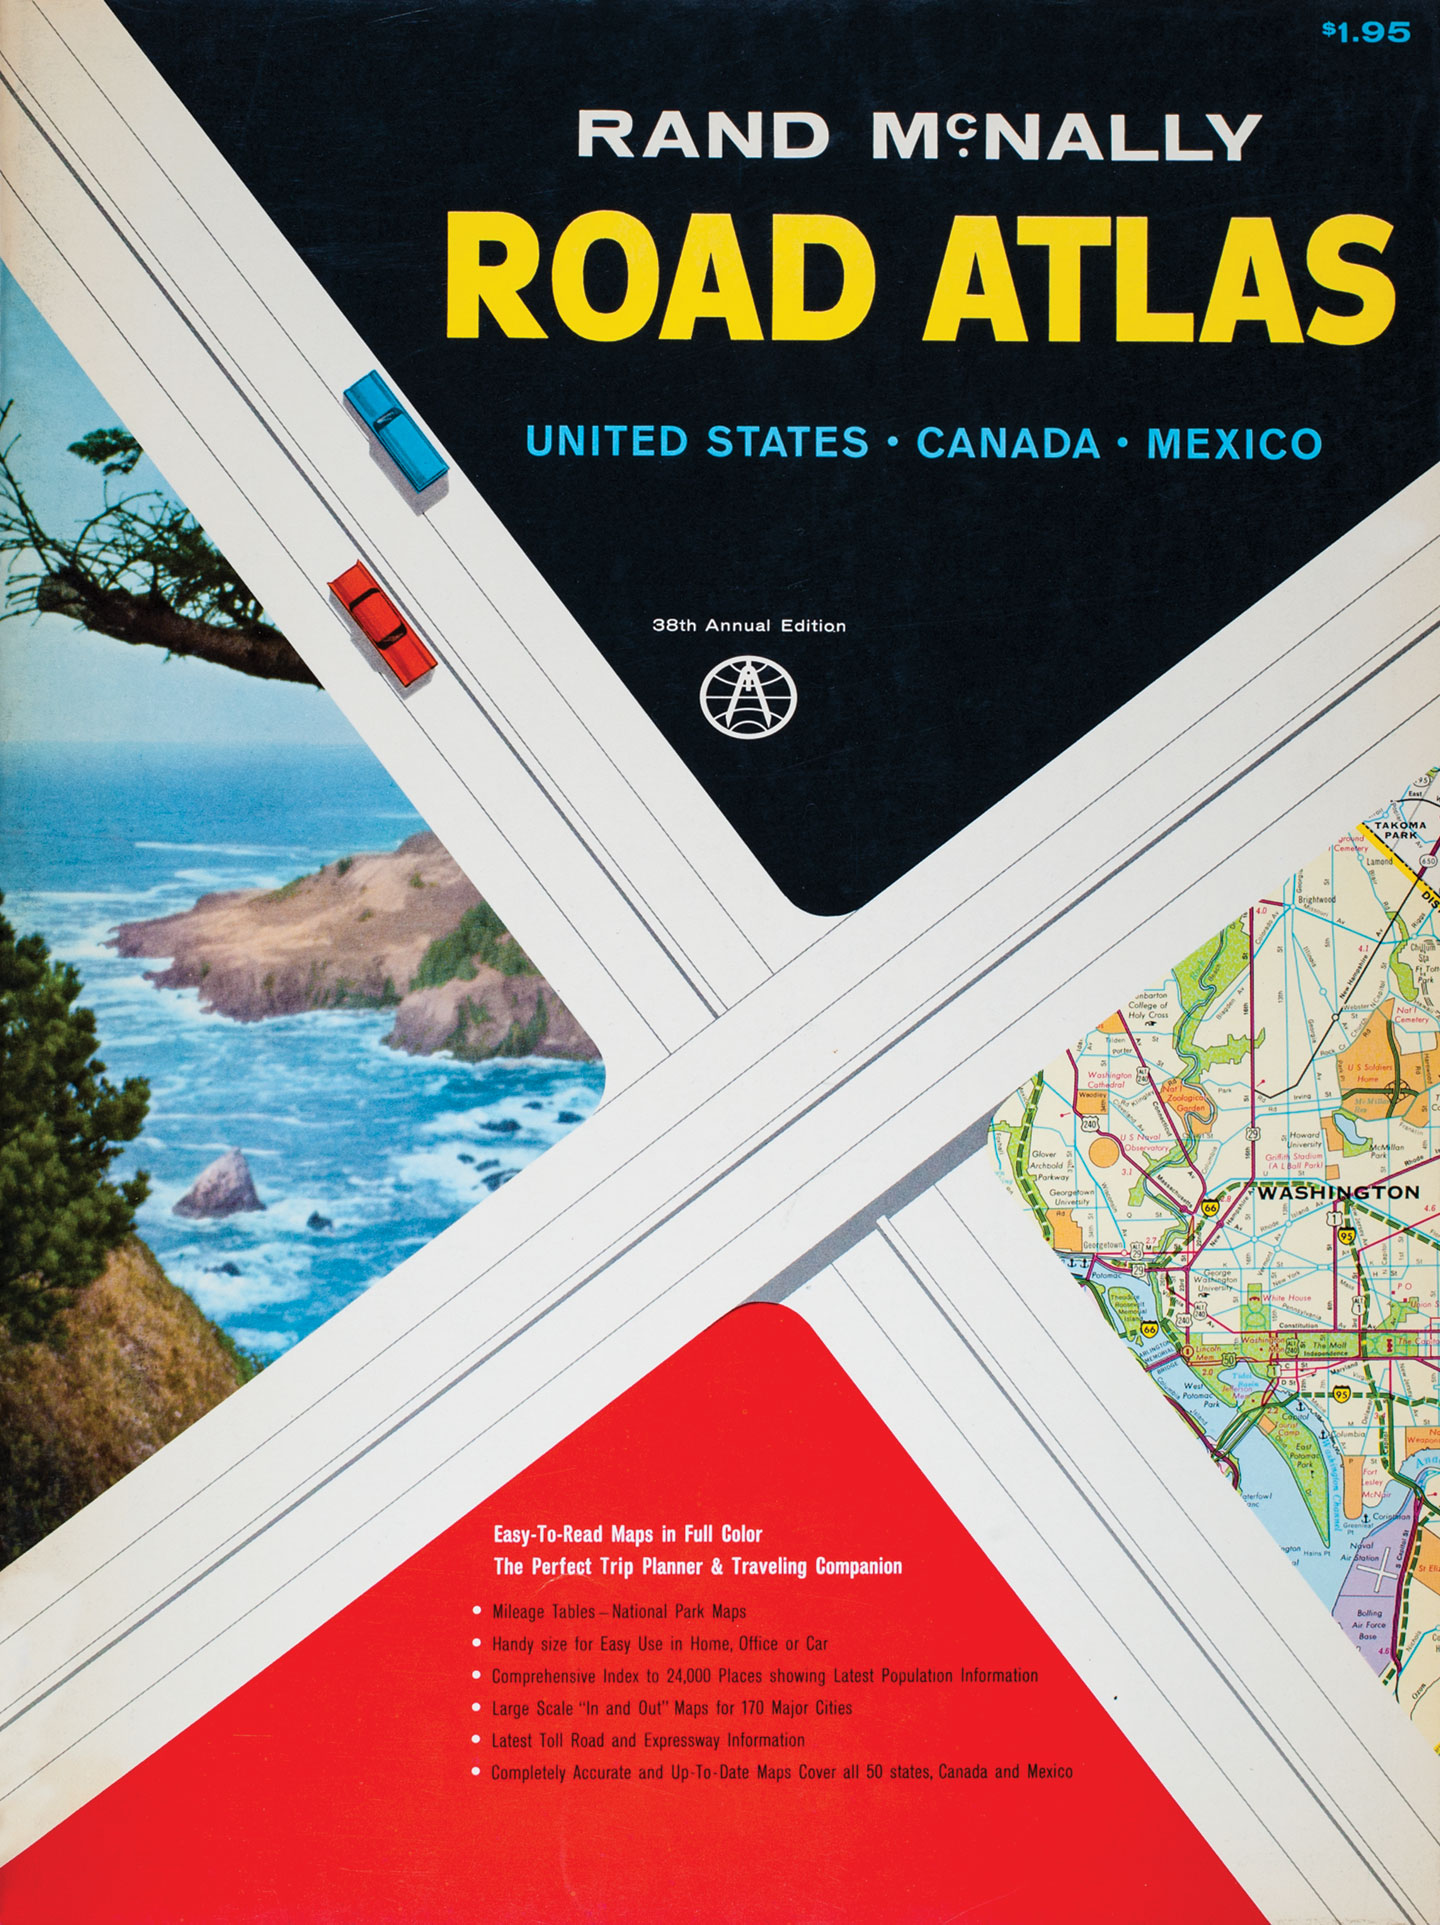 Rand Mcnally Trip Planner : mcnally, planner, McNally, Atlas, Retrospective